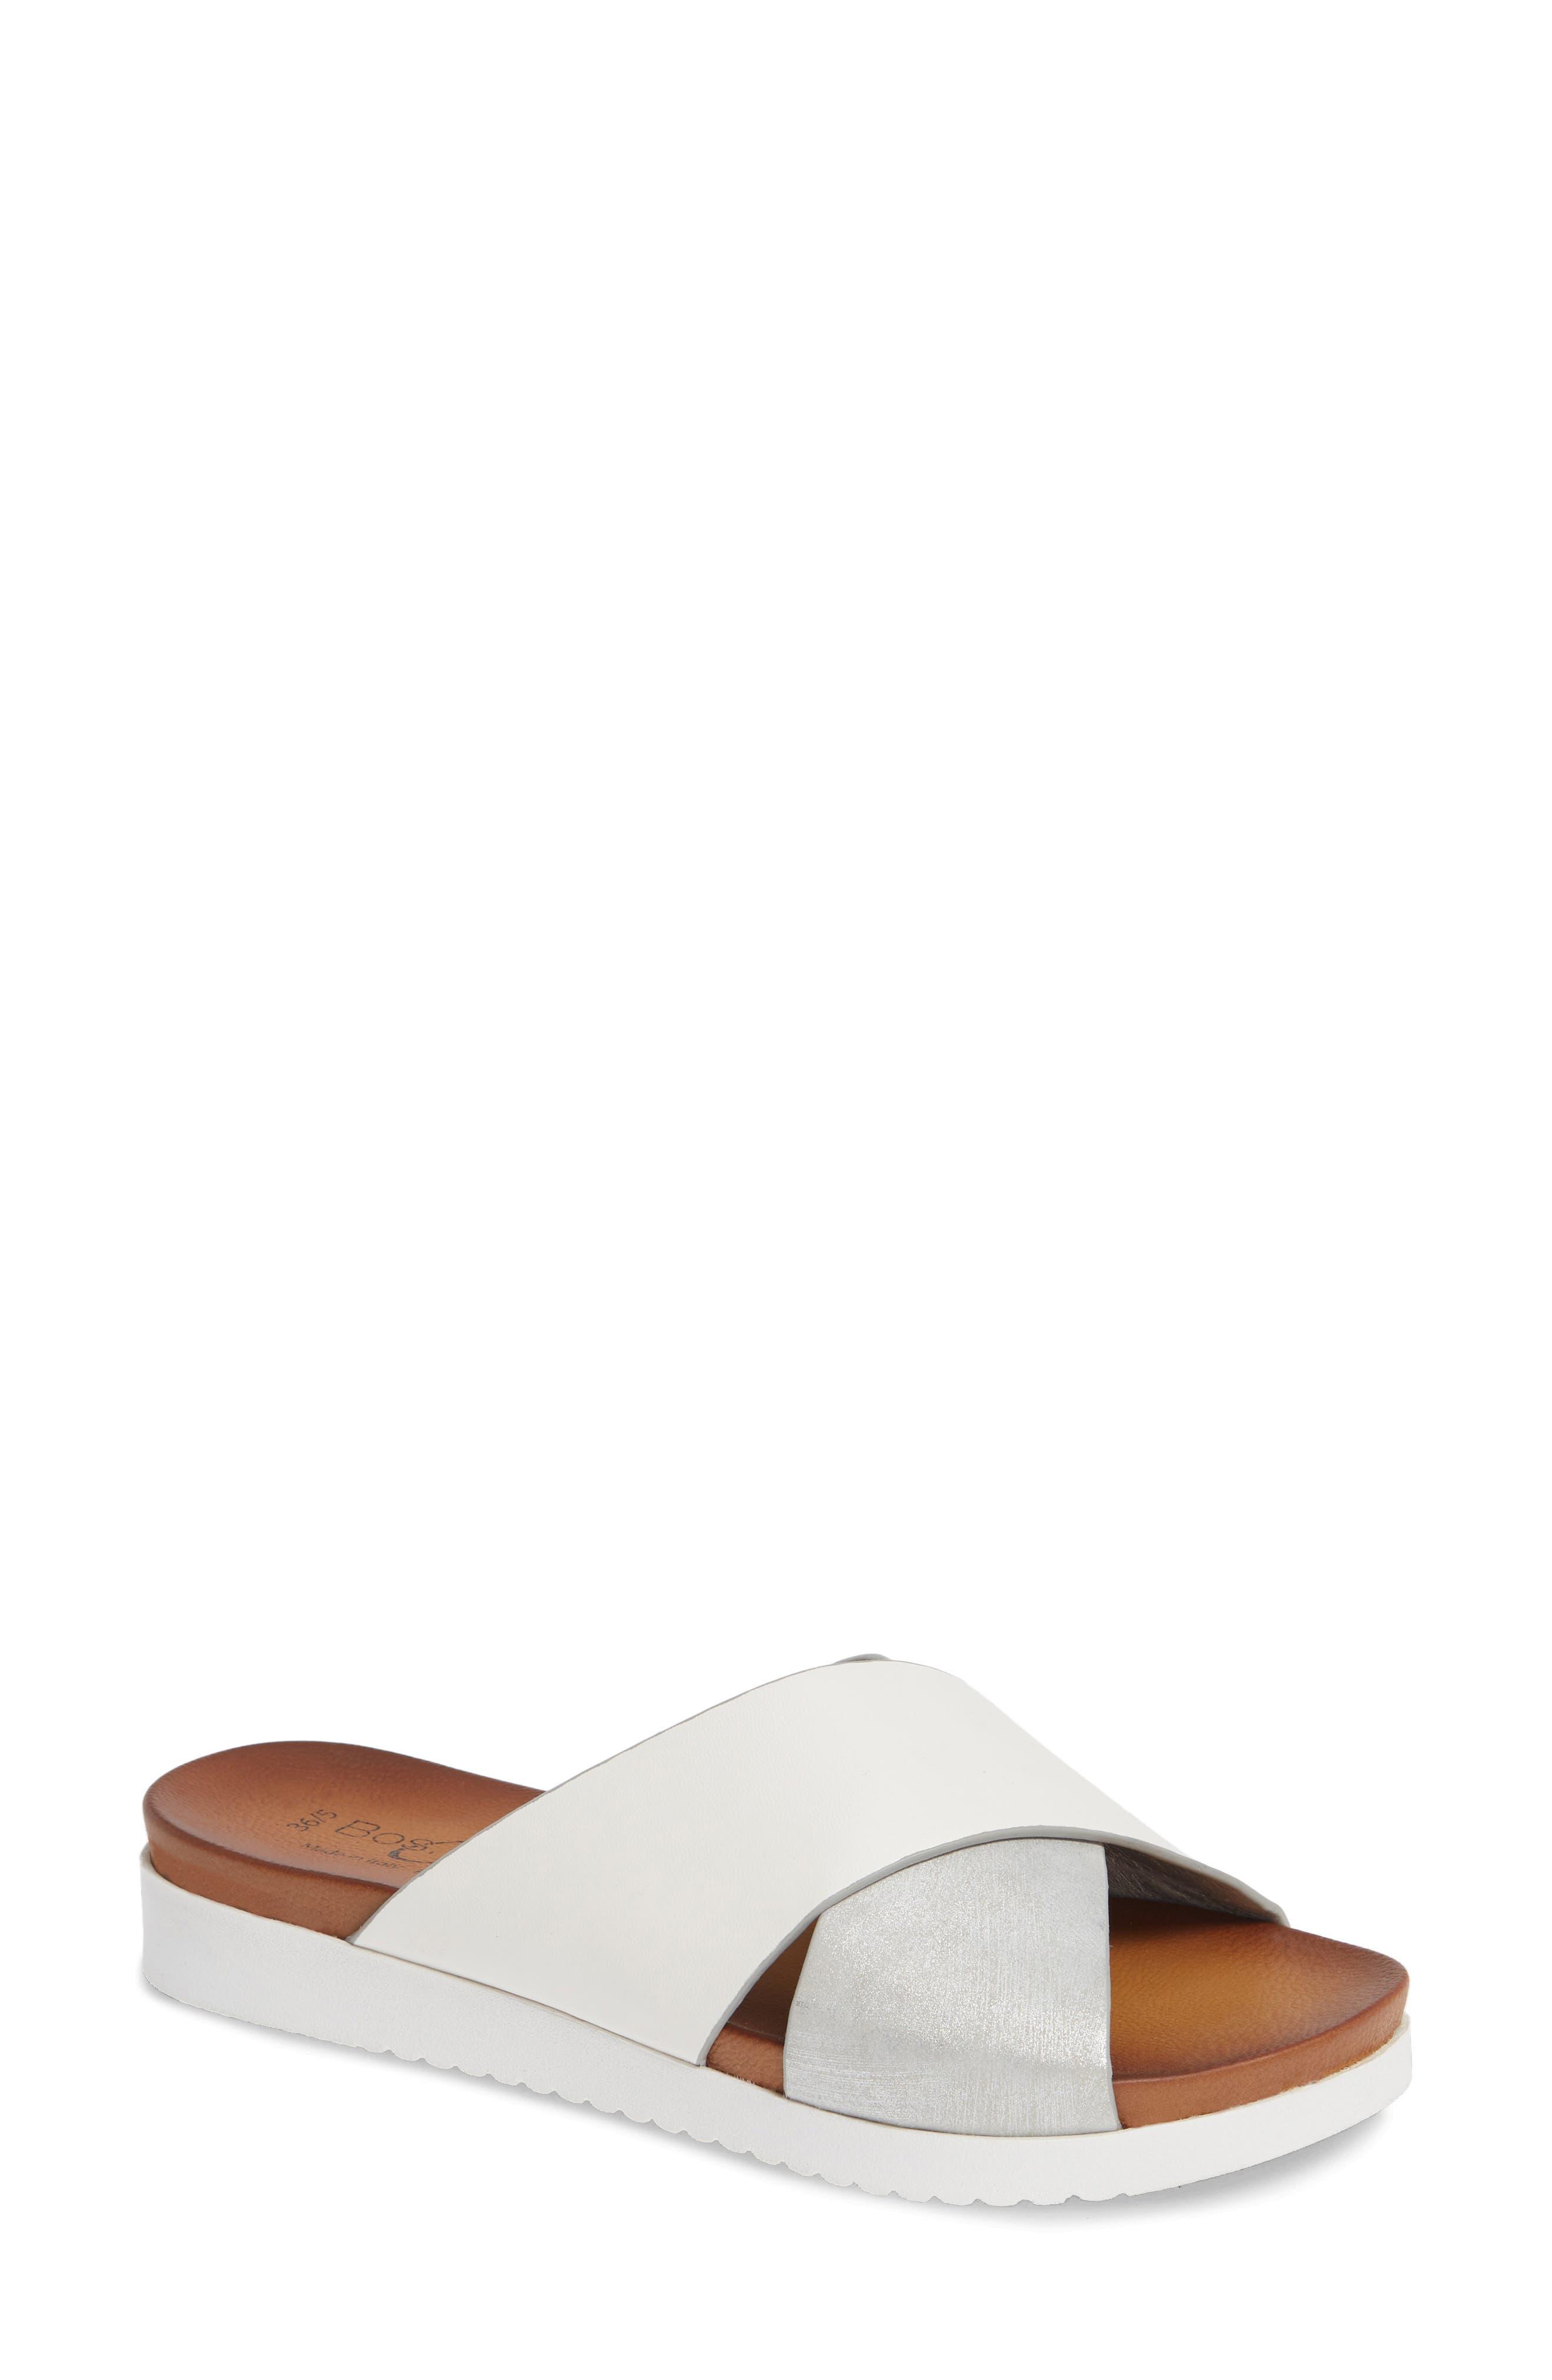 Rwon Slide Sandal,                             Main thumbnail 1, color,                             WHITE/ SILVER LEATHER